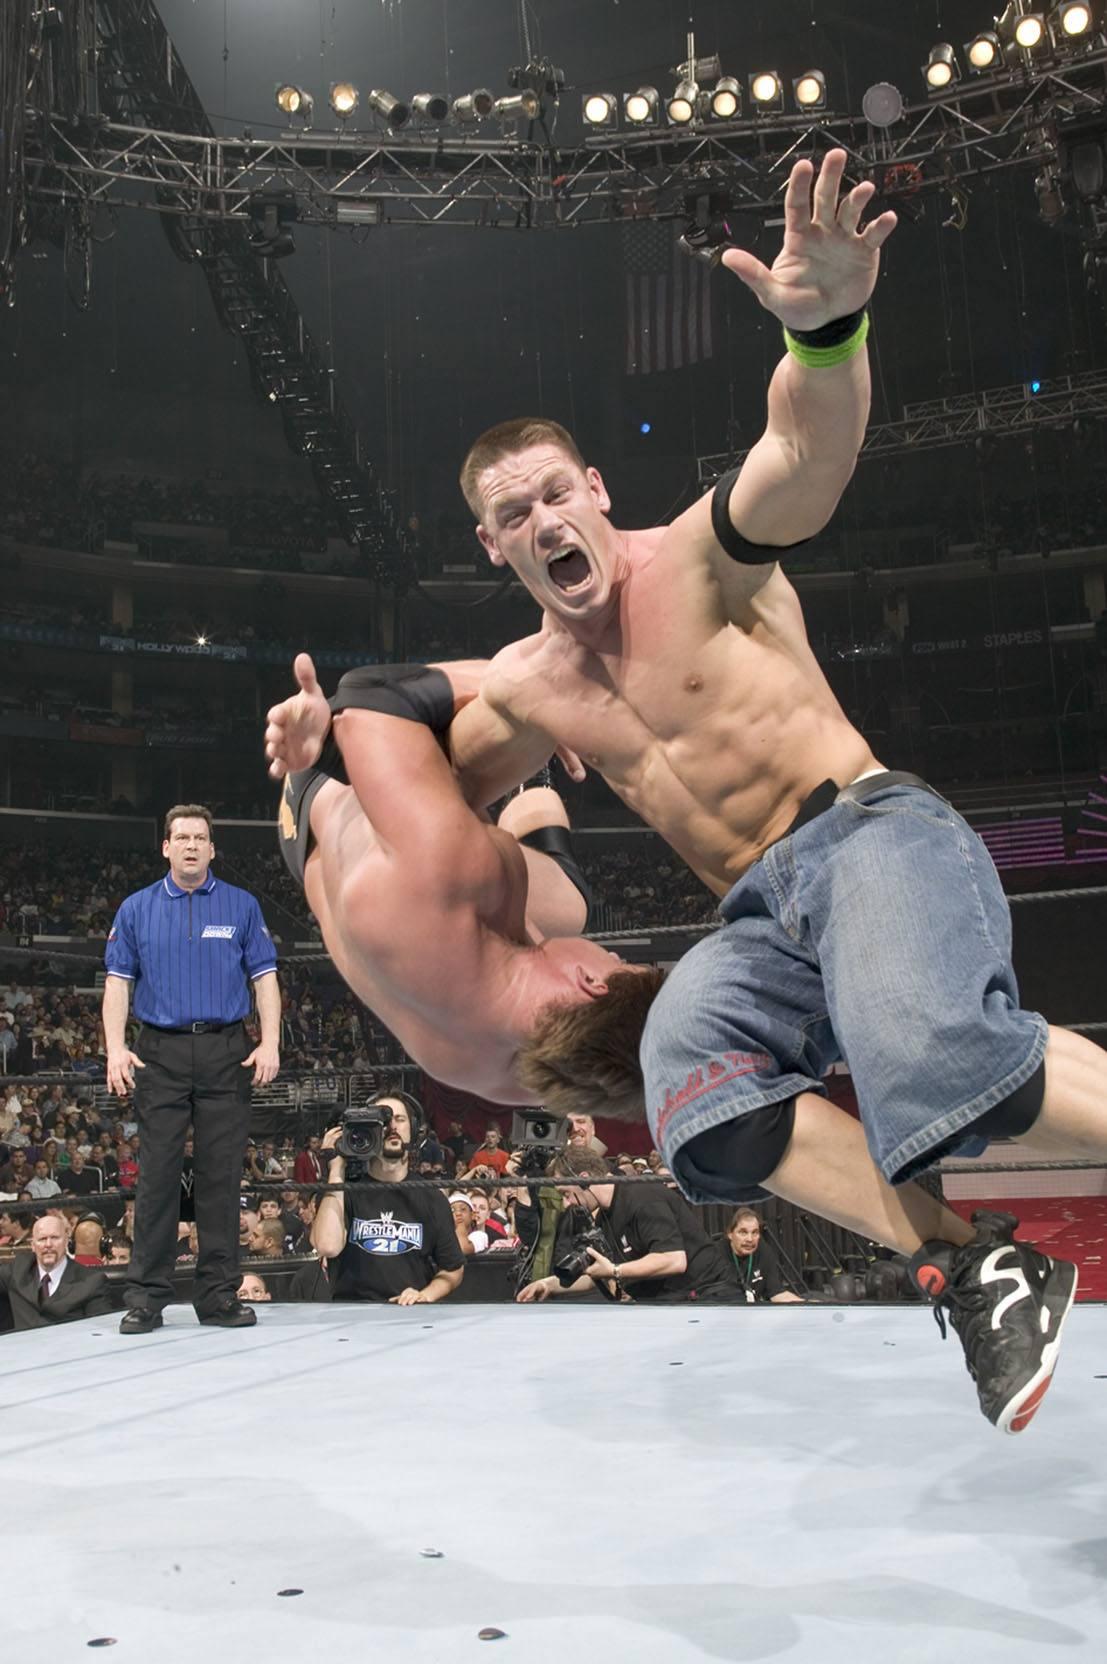 John Cena at WrestleMania 21 in 2005